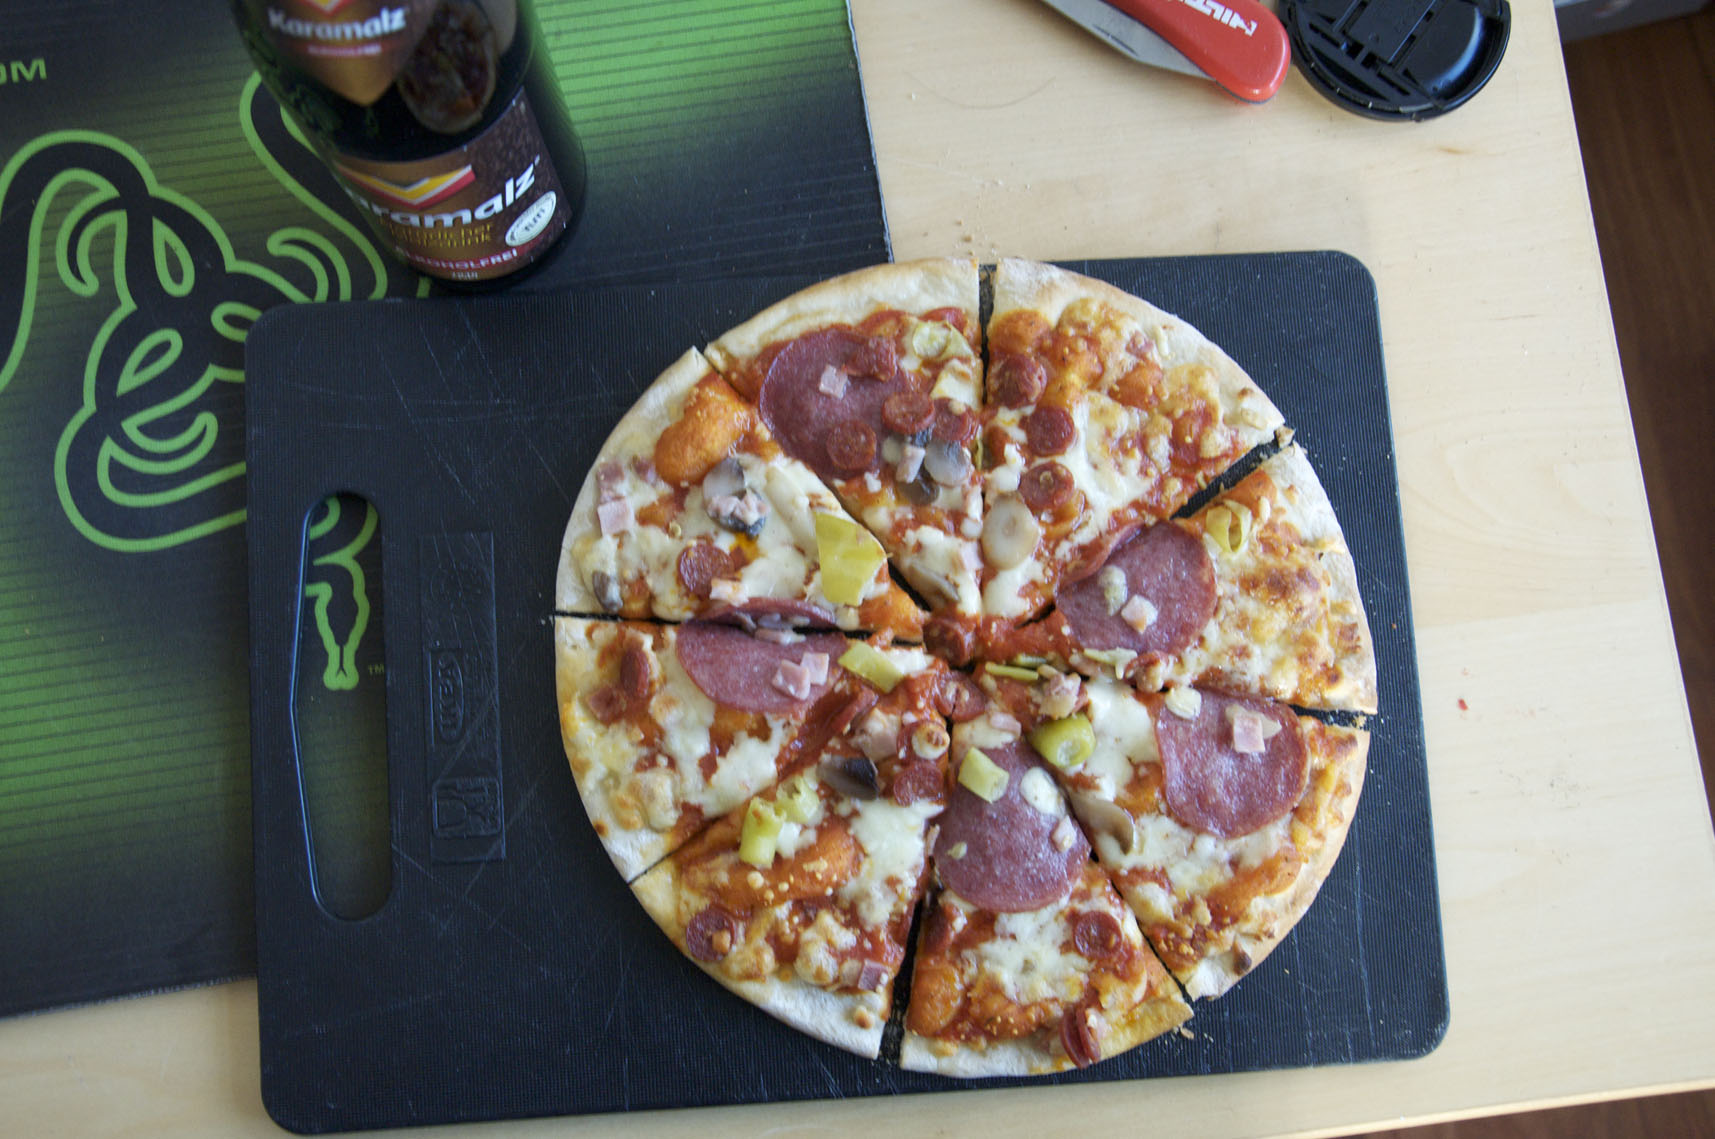 http://foodloader.net/sarglord_2009-11-27_Pizza_Speciale.jpg